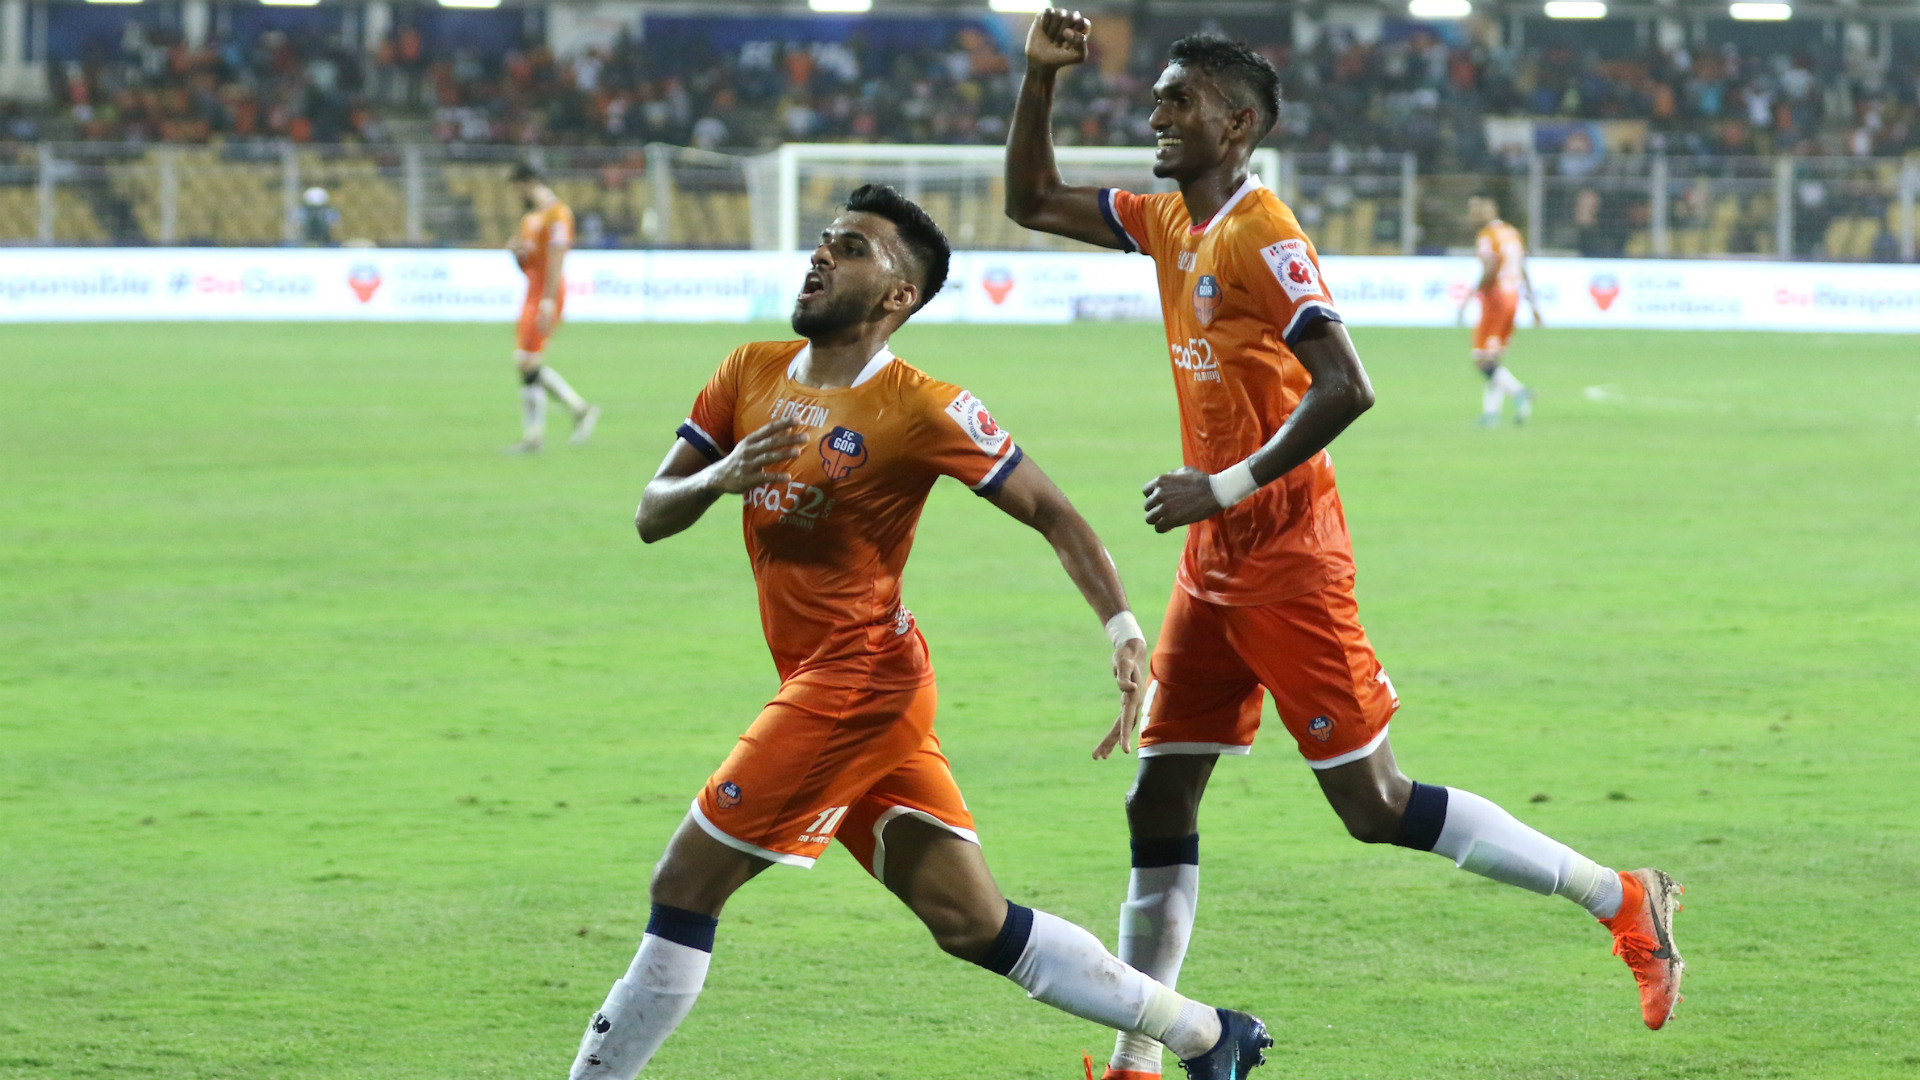 Brandon Fernandes Lenny Rodrigues FC Goa ISL 6